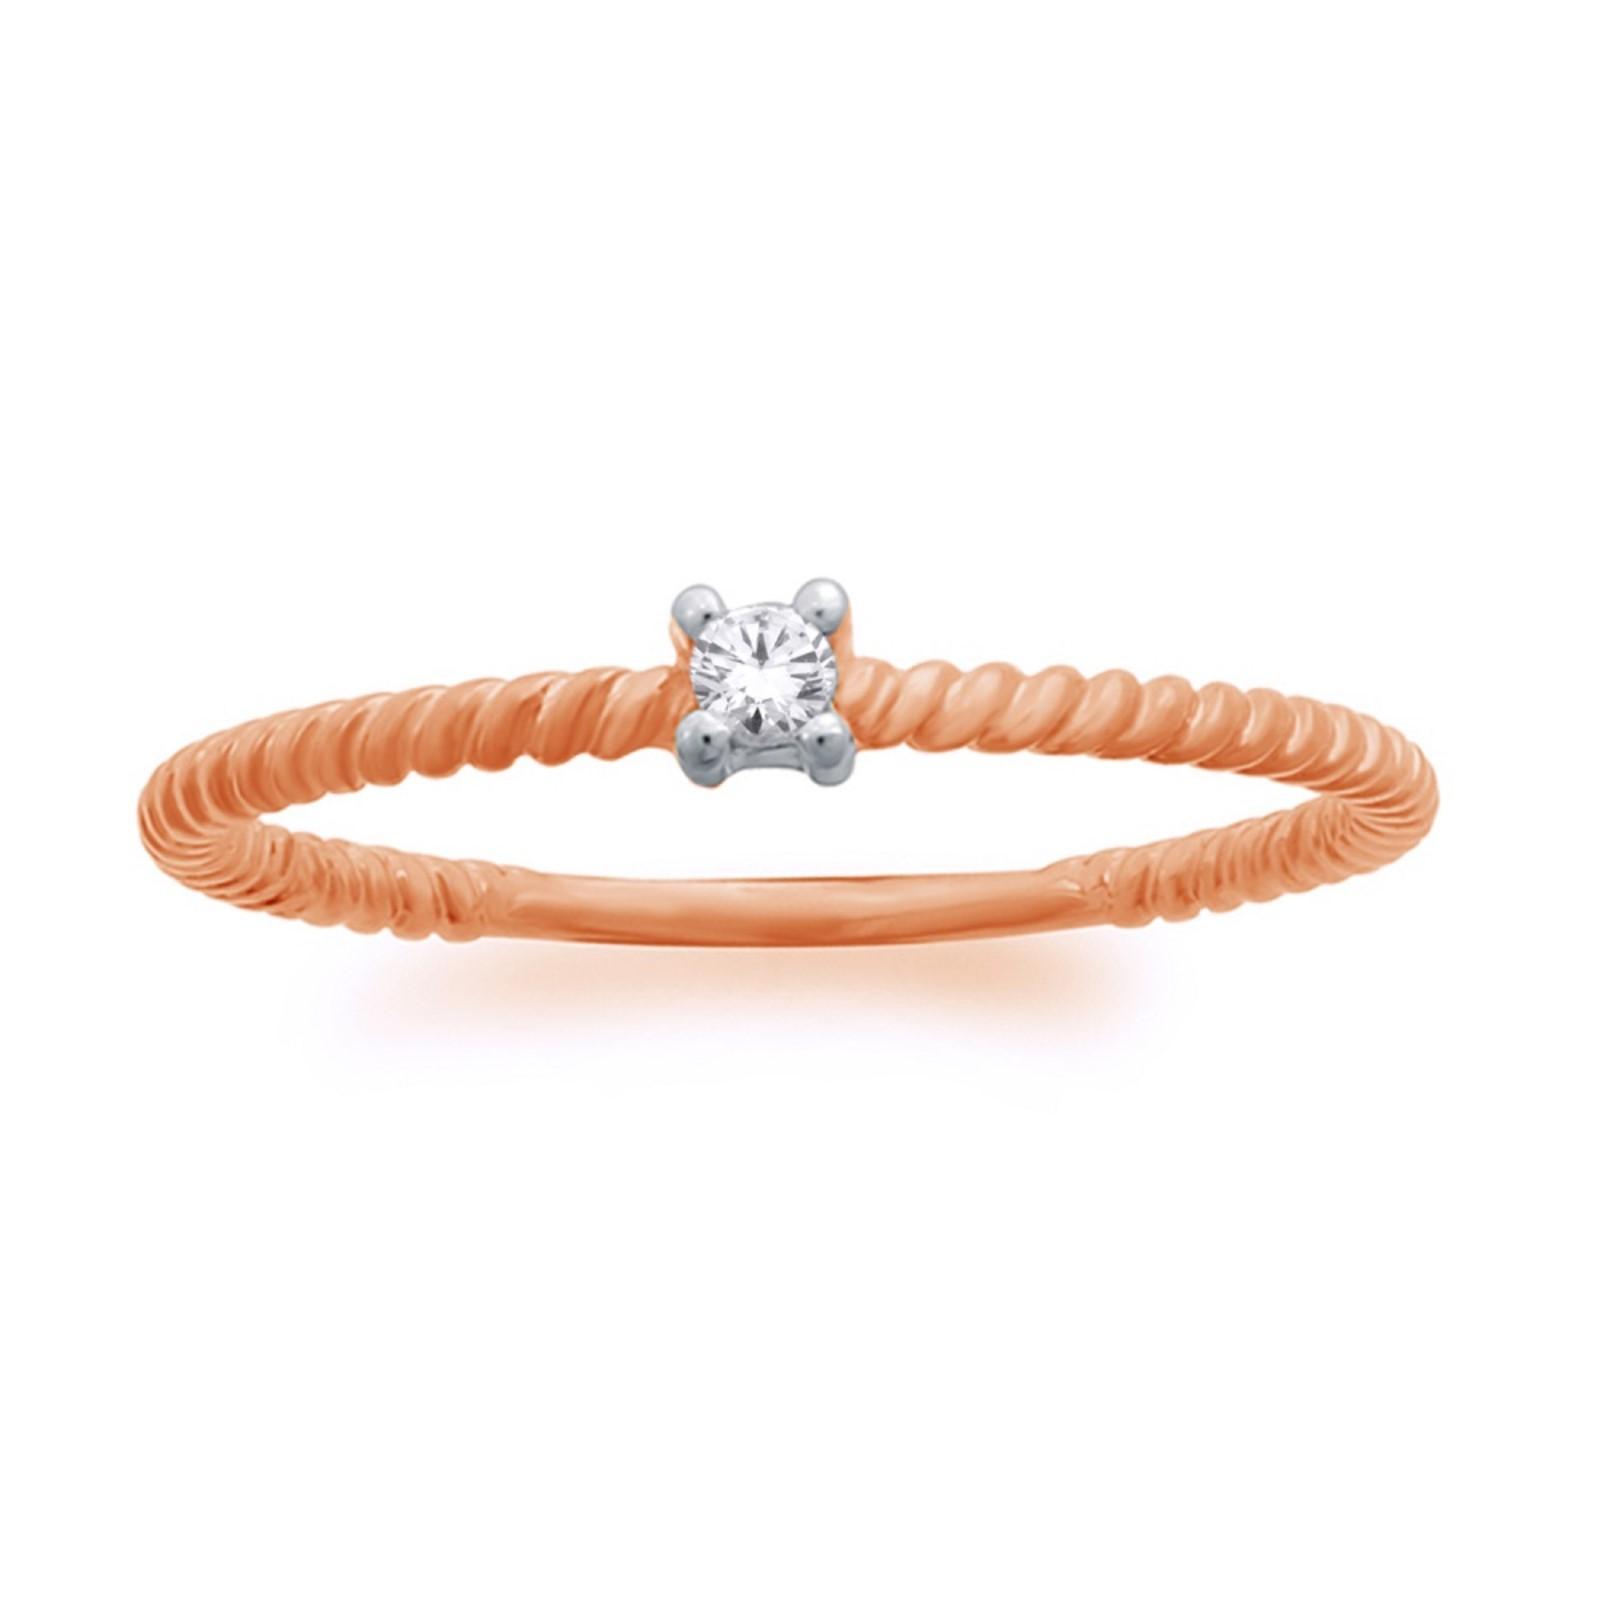 Diamond Twist Band - $395